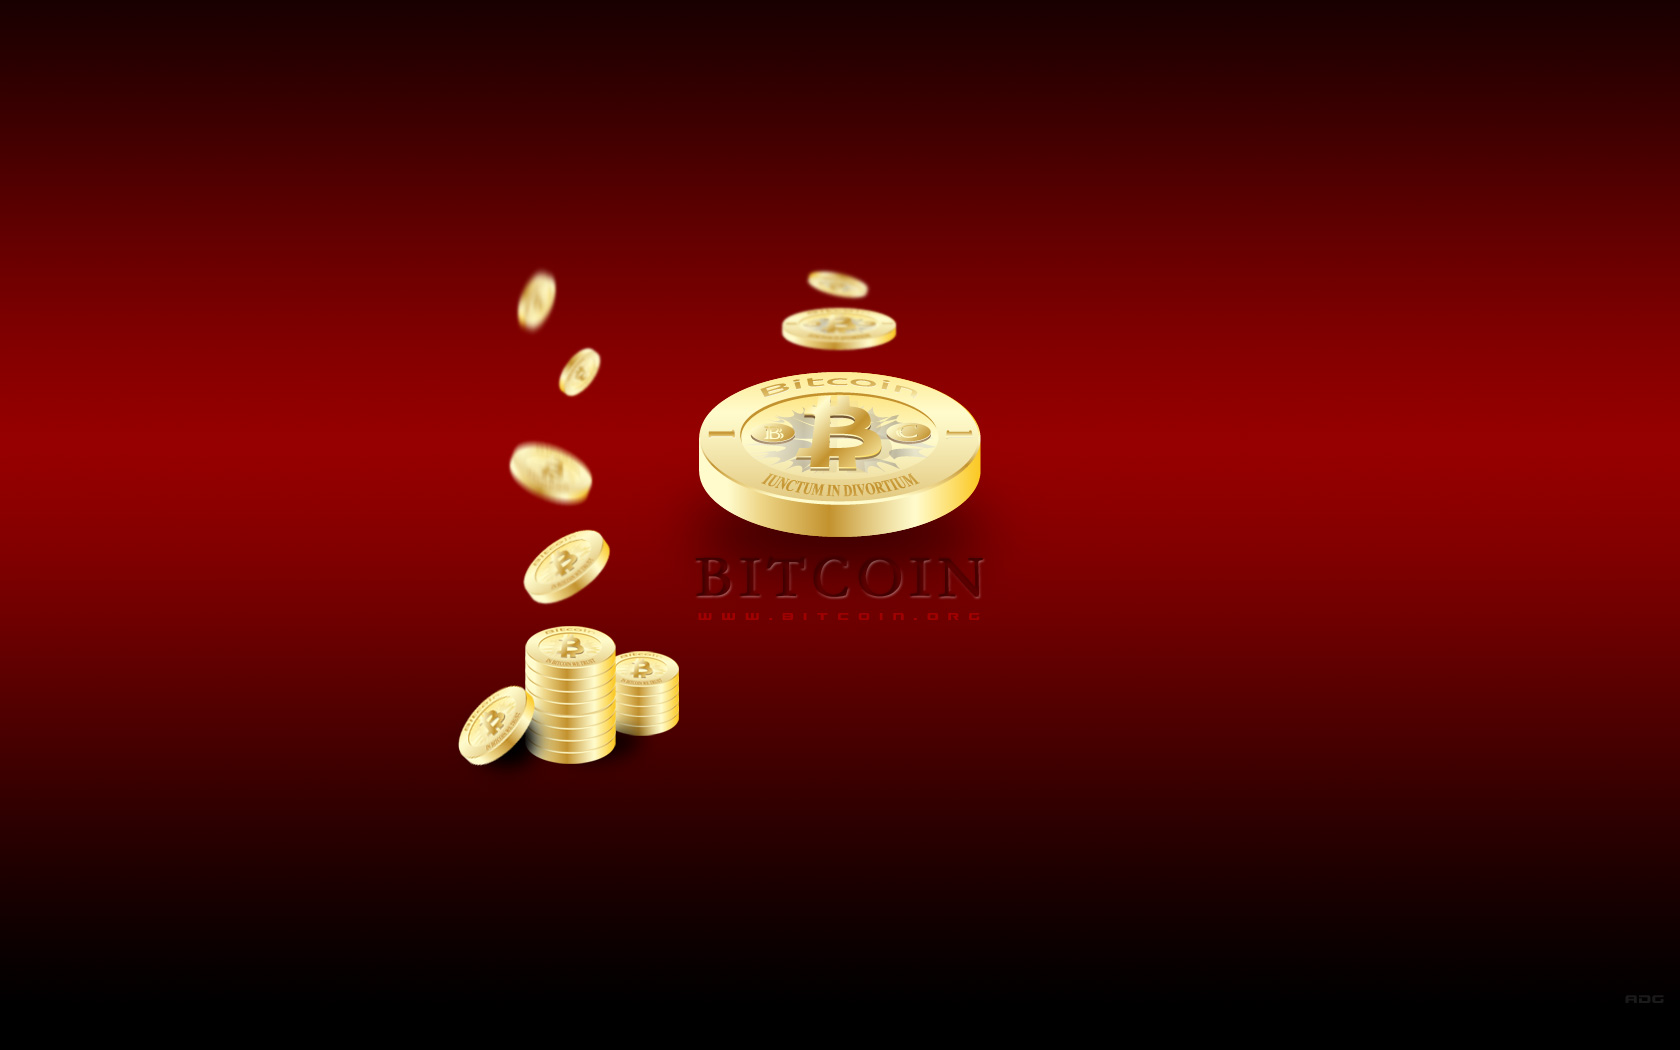 Bitcoin DskTp Wallpaper Red 2